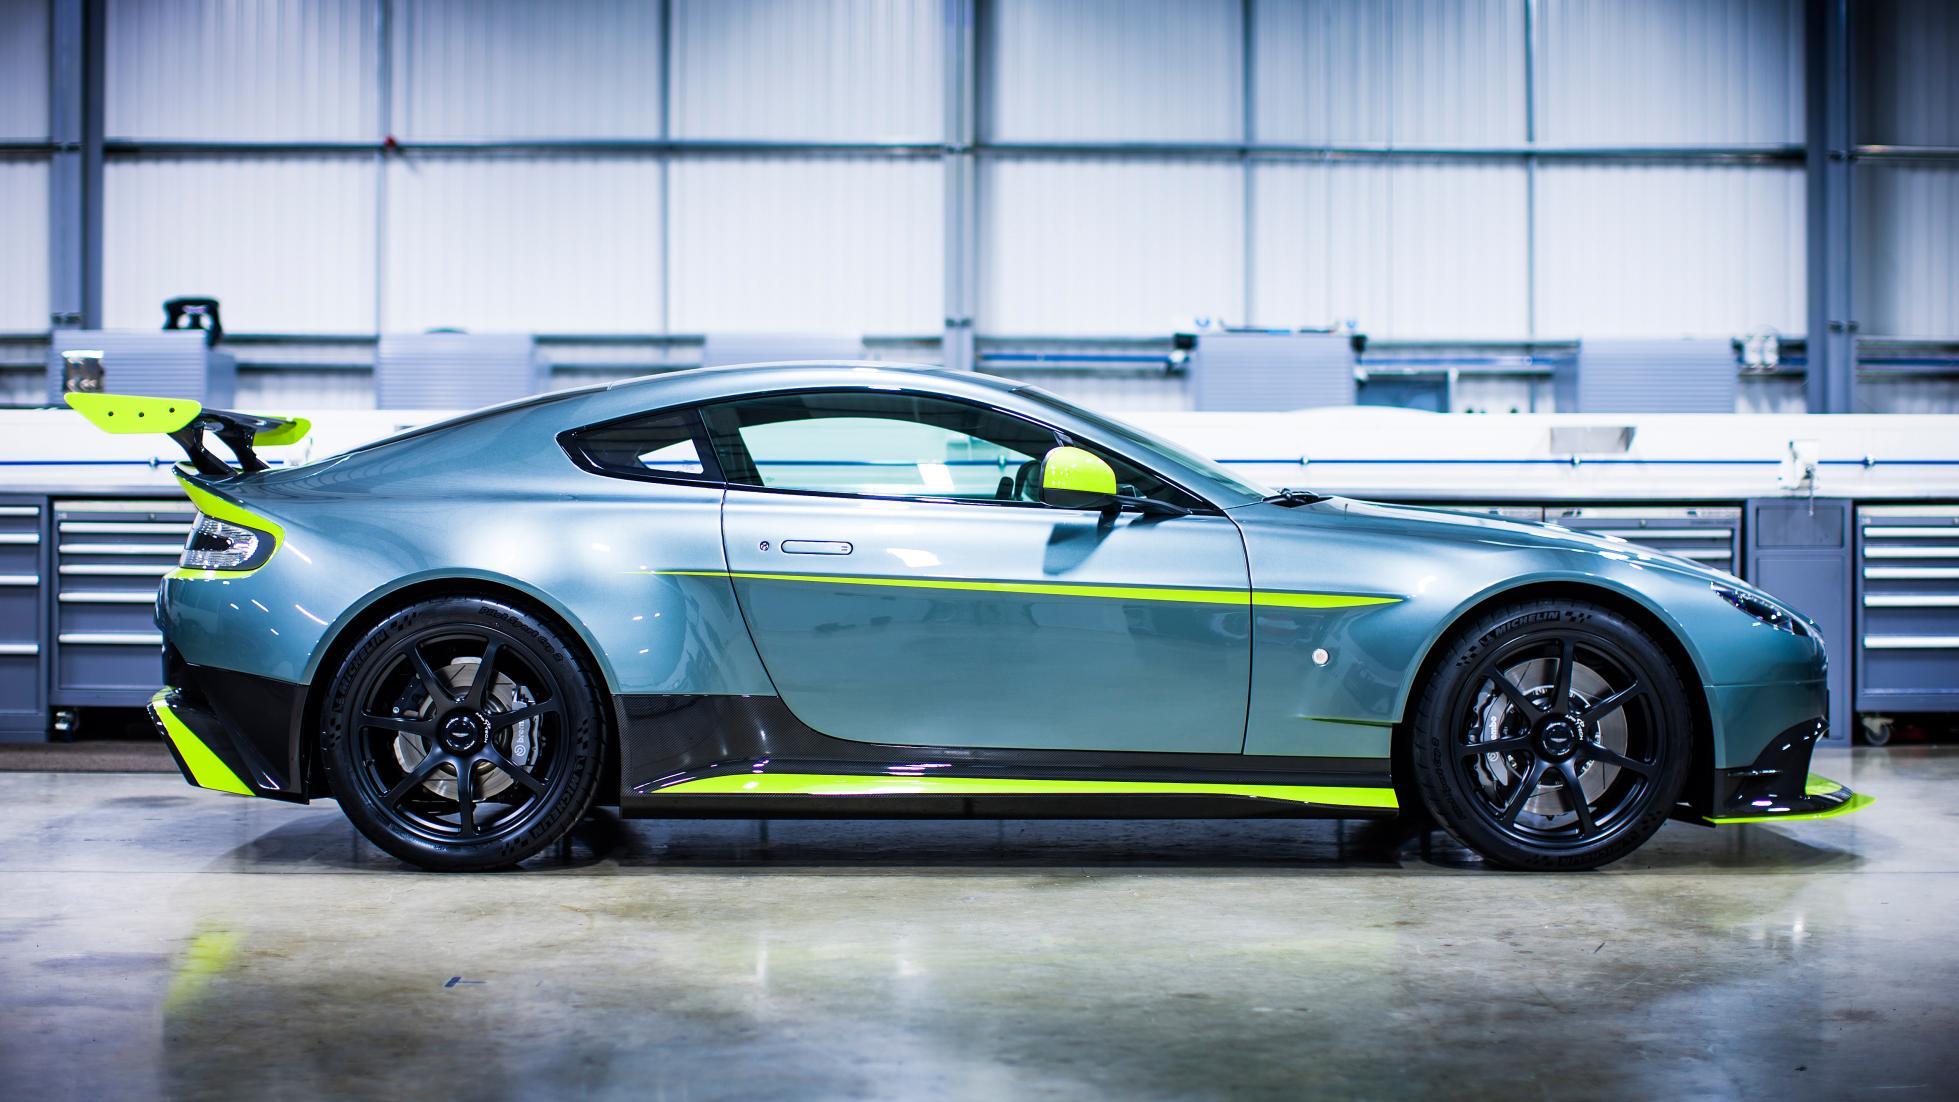 2017 Aston Martin Vantage Gt8 Revealed The Supercar Blog